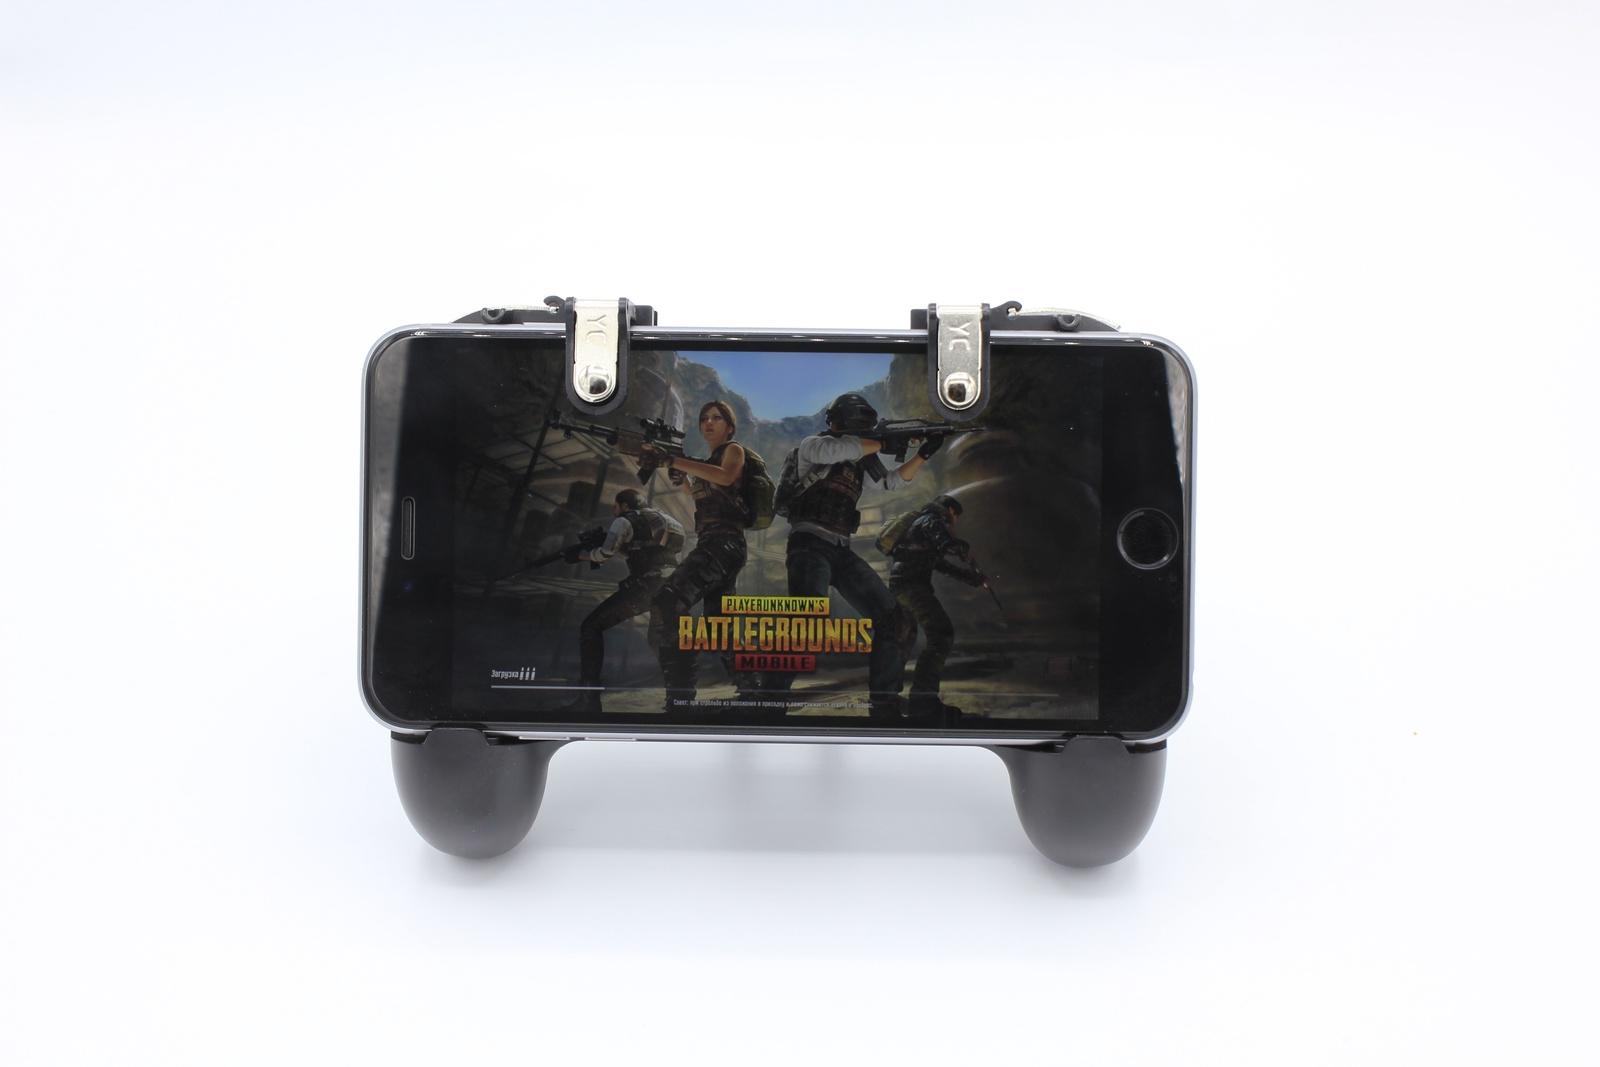 Джойстик для смартфона MG джойстик для телефона